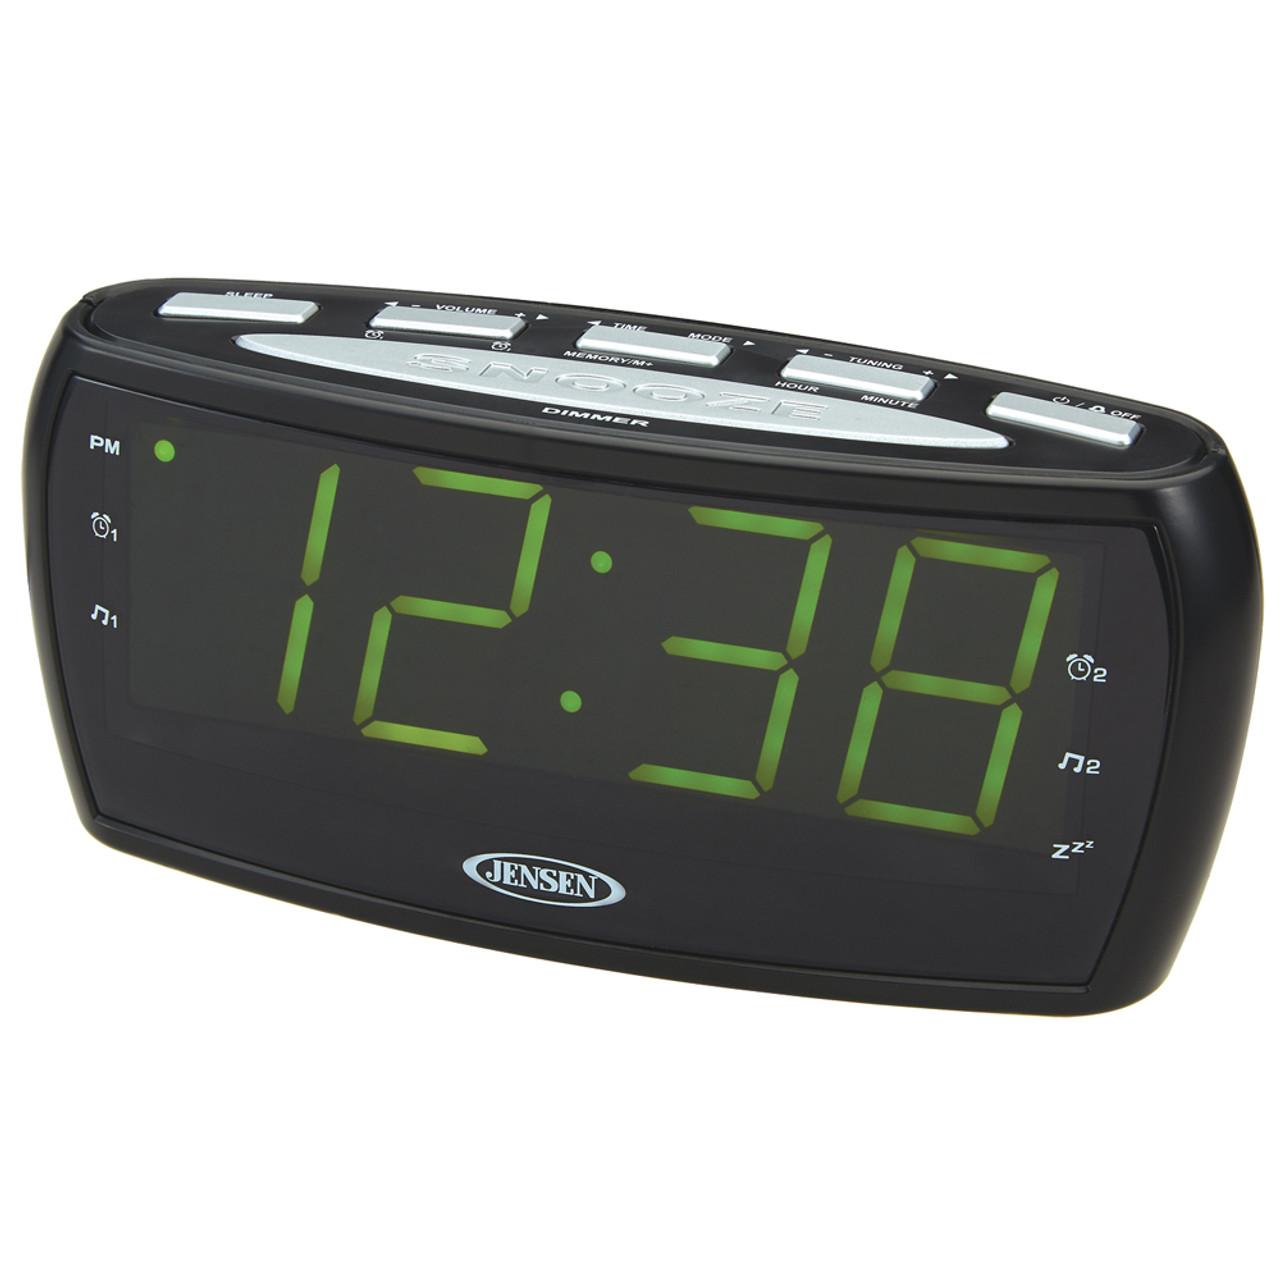 "Jensen AM/FM Alarm Clock Radio 1.8"" Green LED Display"